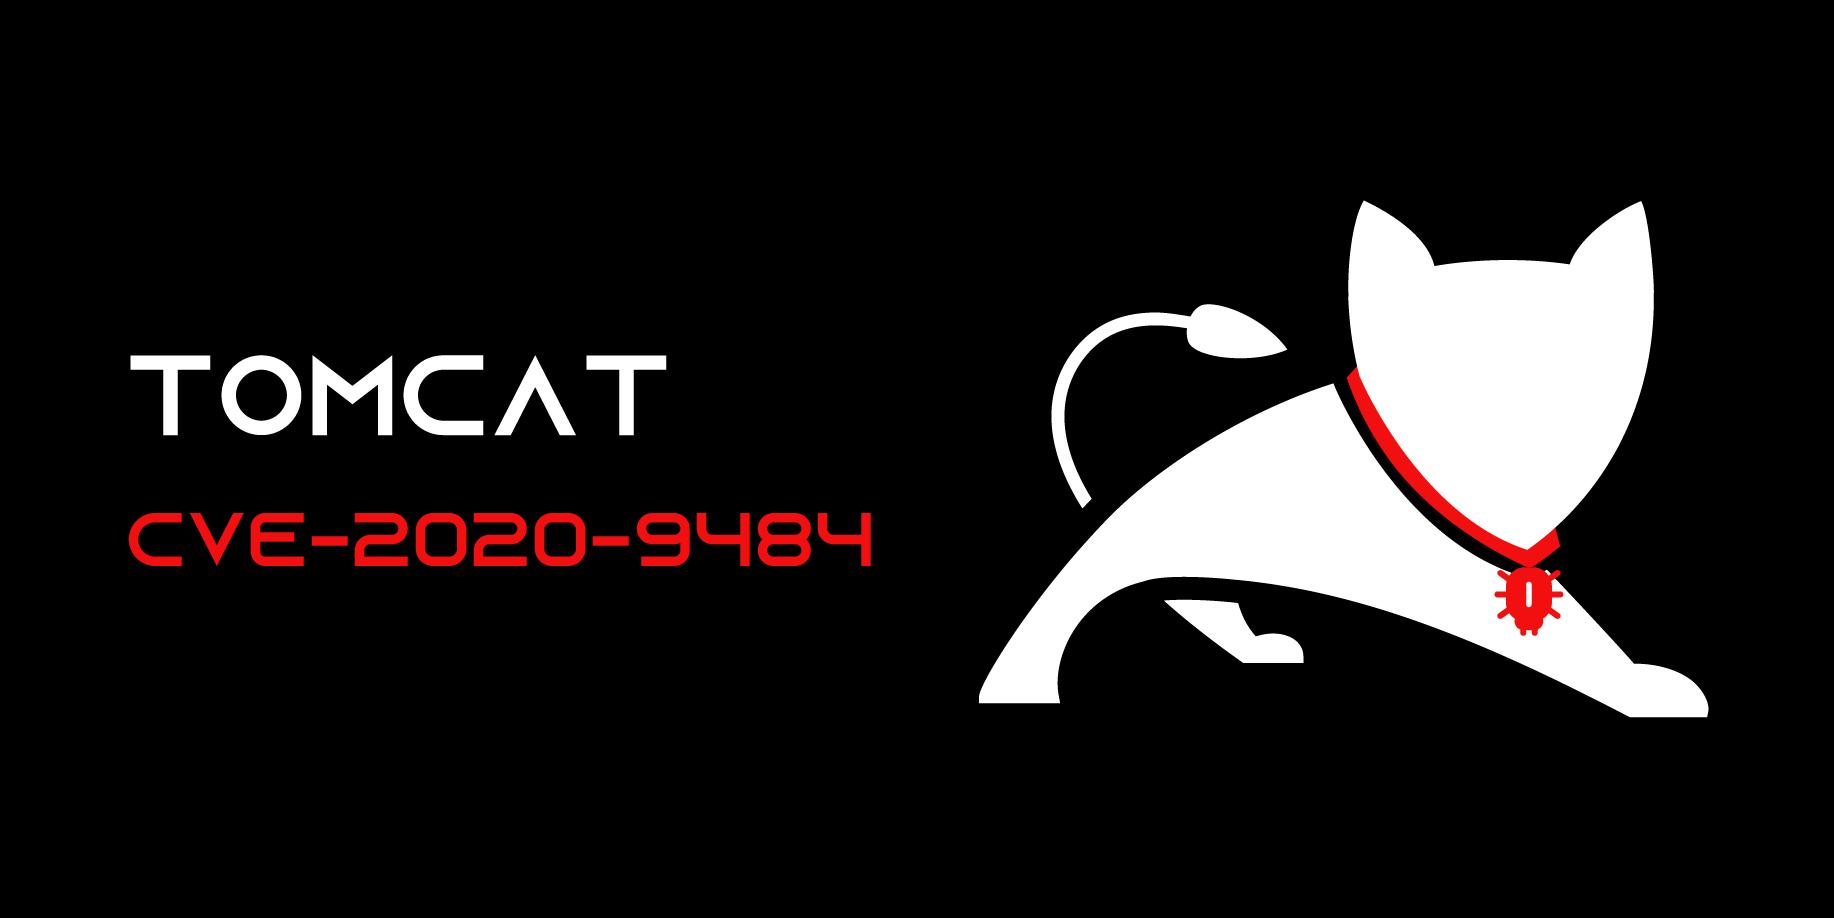 Tomcat_CVE-2020-9484_RavinAcademy-1